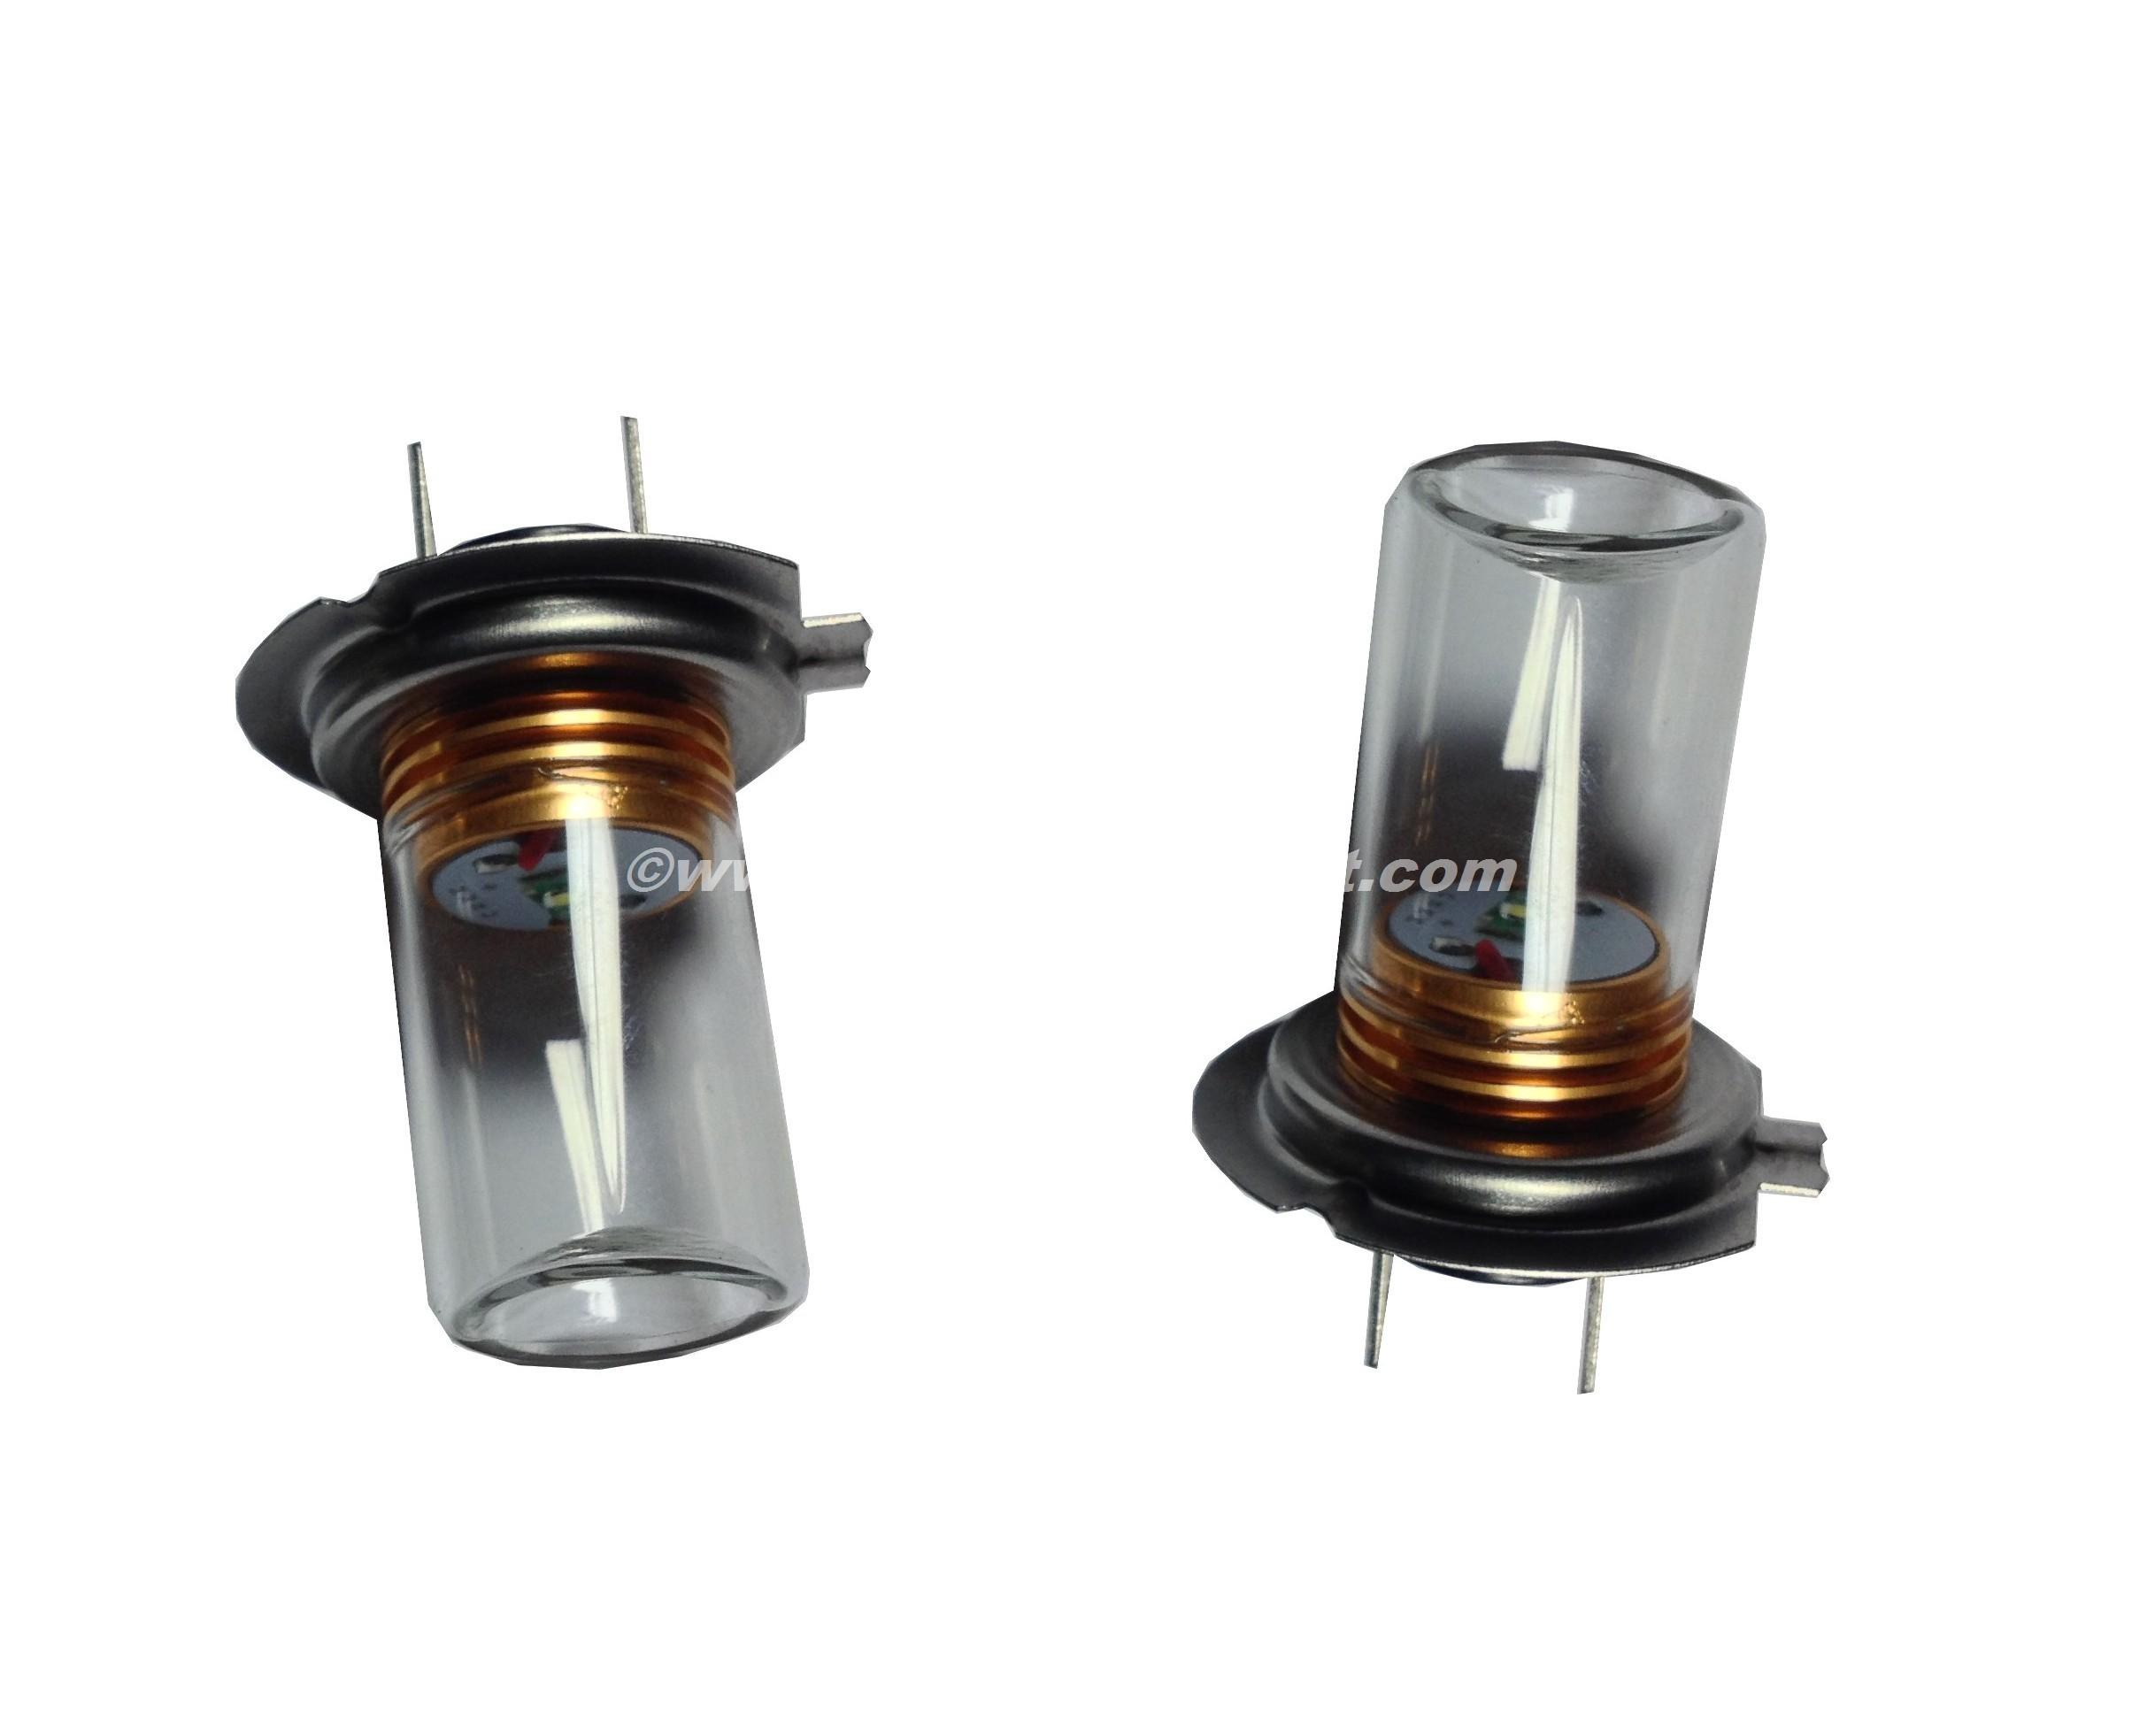 2 ampoules Cree H7 5W avec Verre Blanc Pur - Xenon Discount